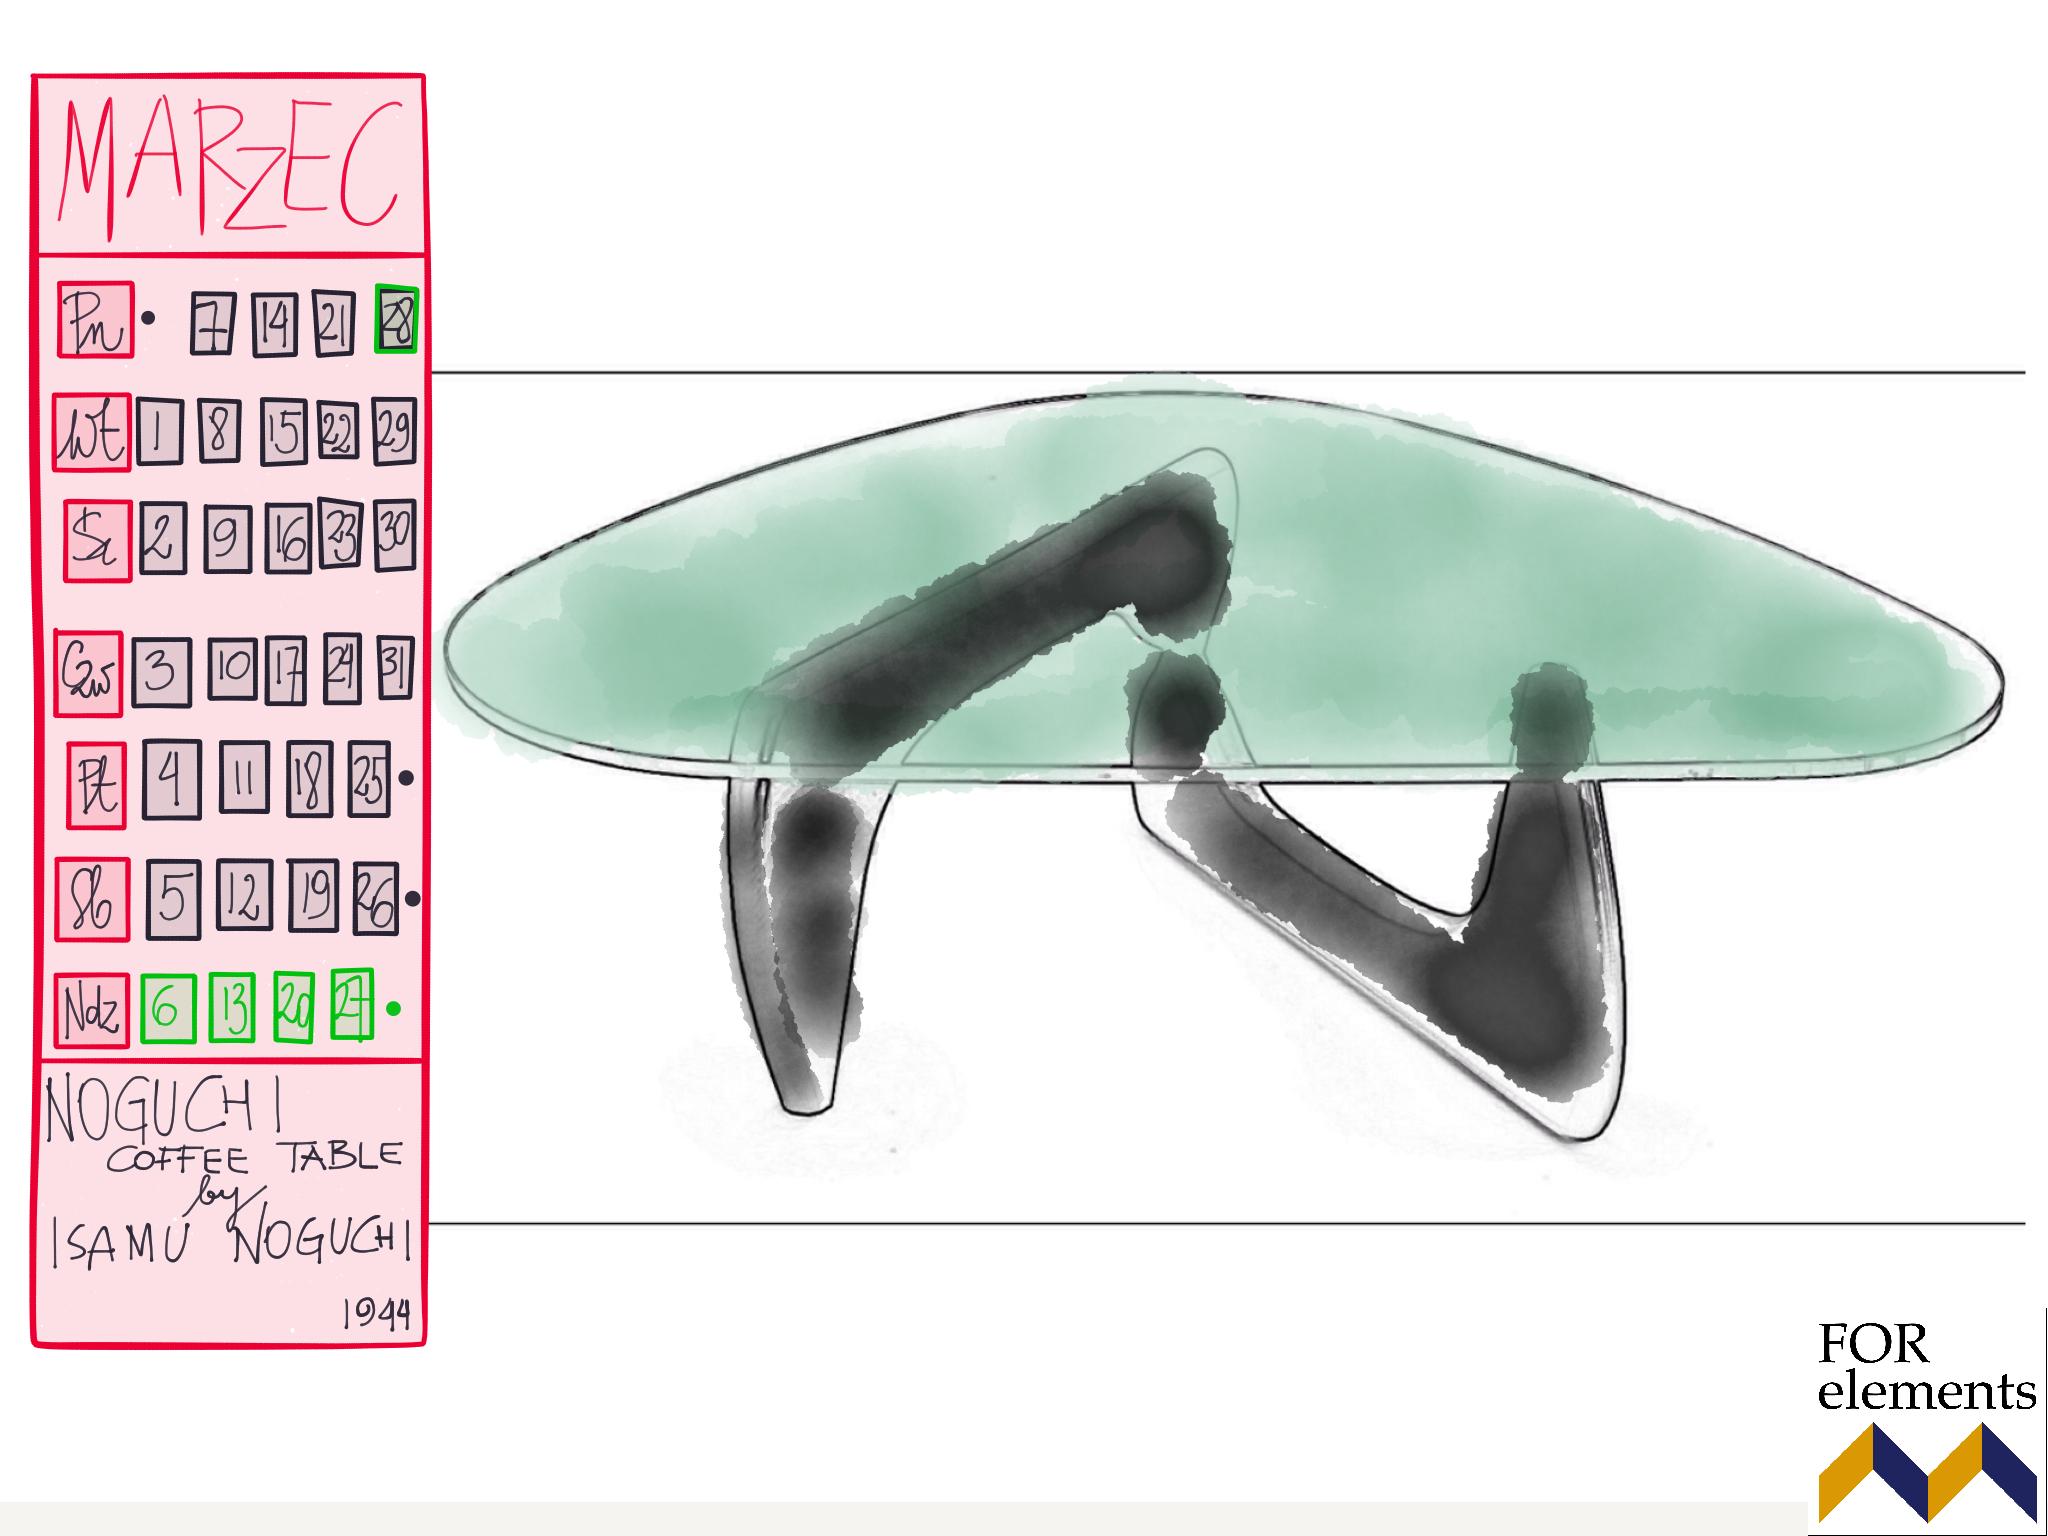 3 noguchi_coffee_table_isamu_noguchi_hermann_miller_vitra_calendar_2016_design_icons_furniture_interior_ideas_home_decorationg_forelements_blog